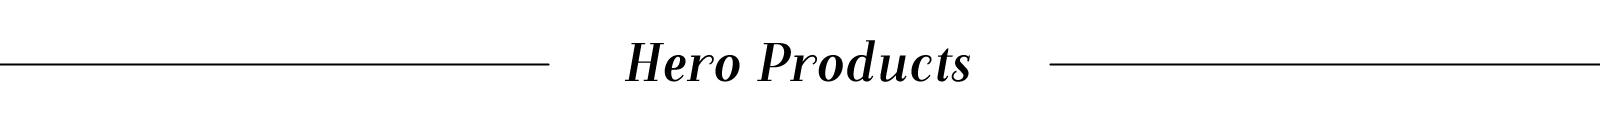 Kose Hero Product Title